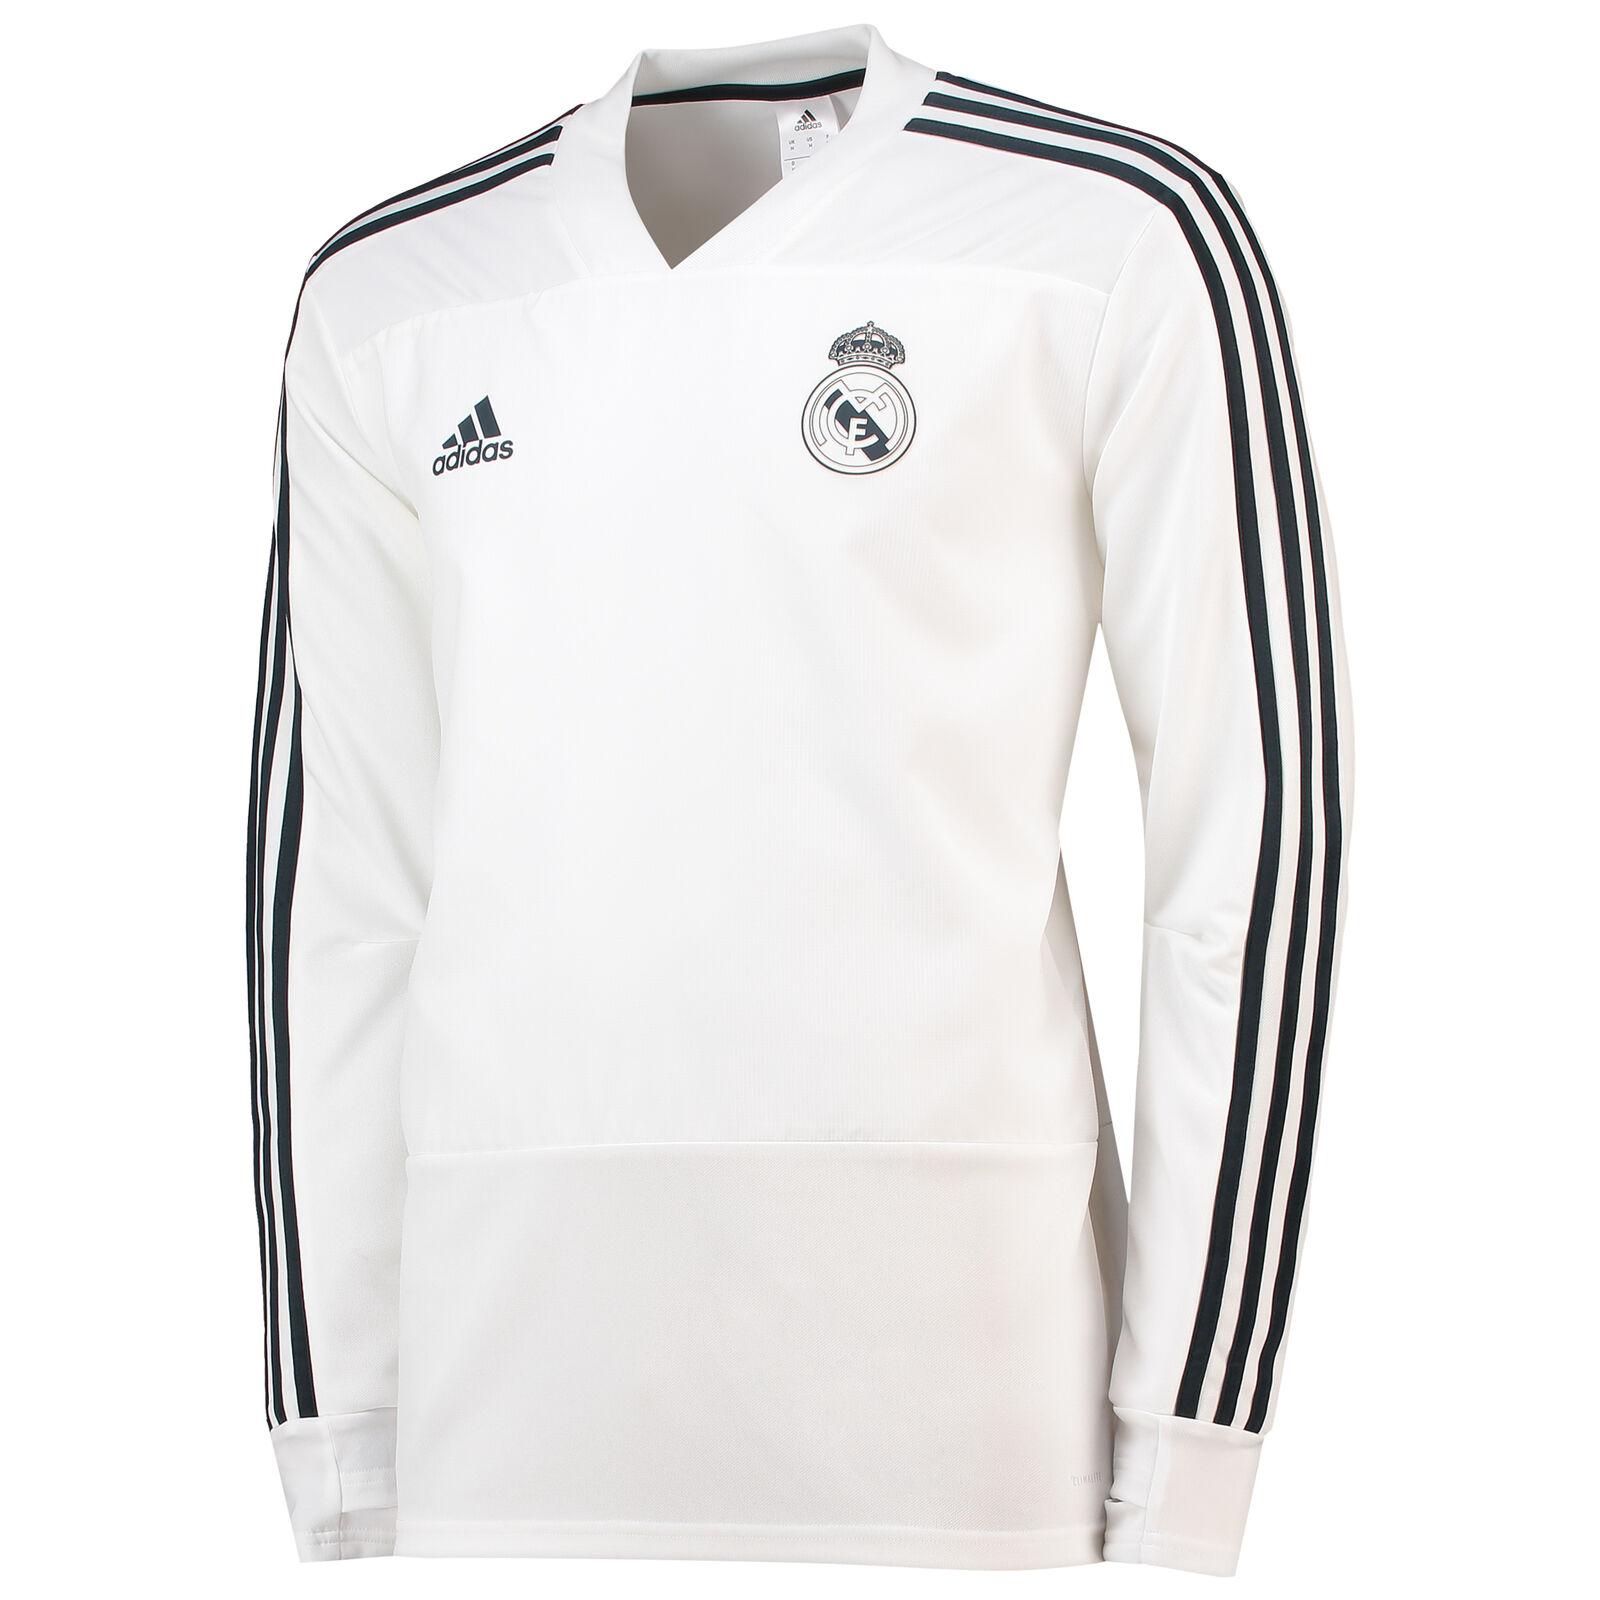 Real Madrid Training Shirt Sport Oberteil Fußball Trikot Weiß Herren Herren Herren adidas 2e1fc7